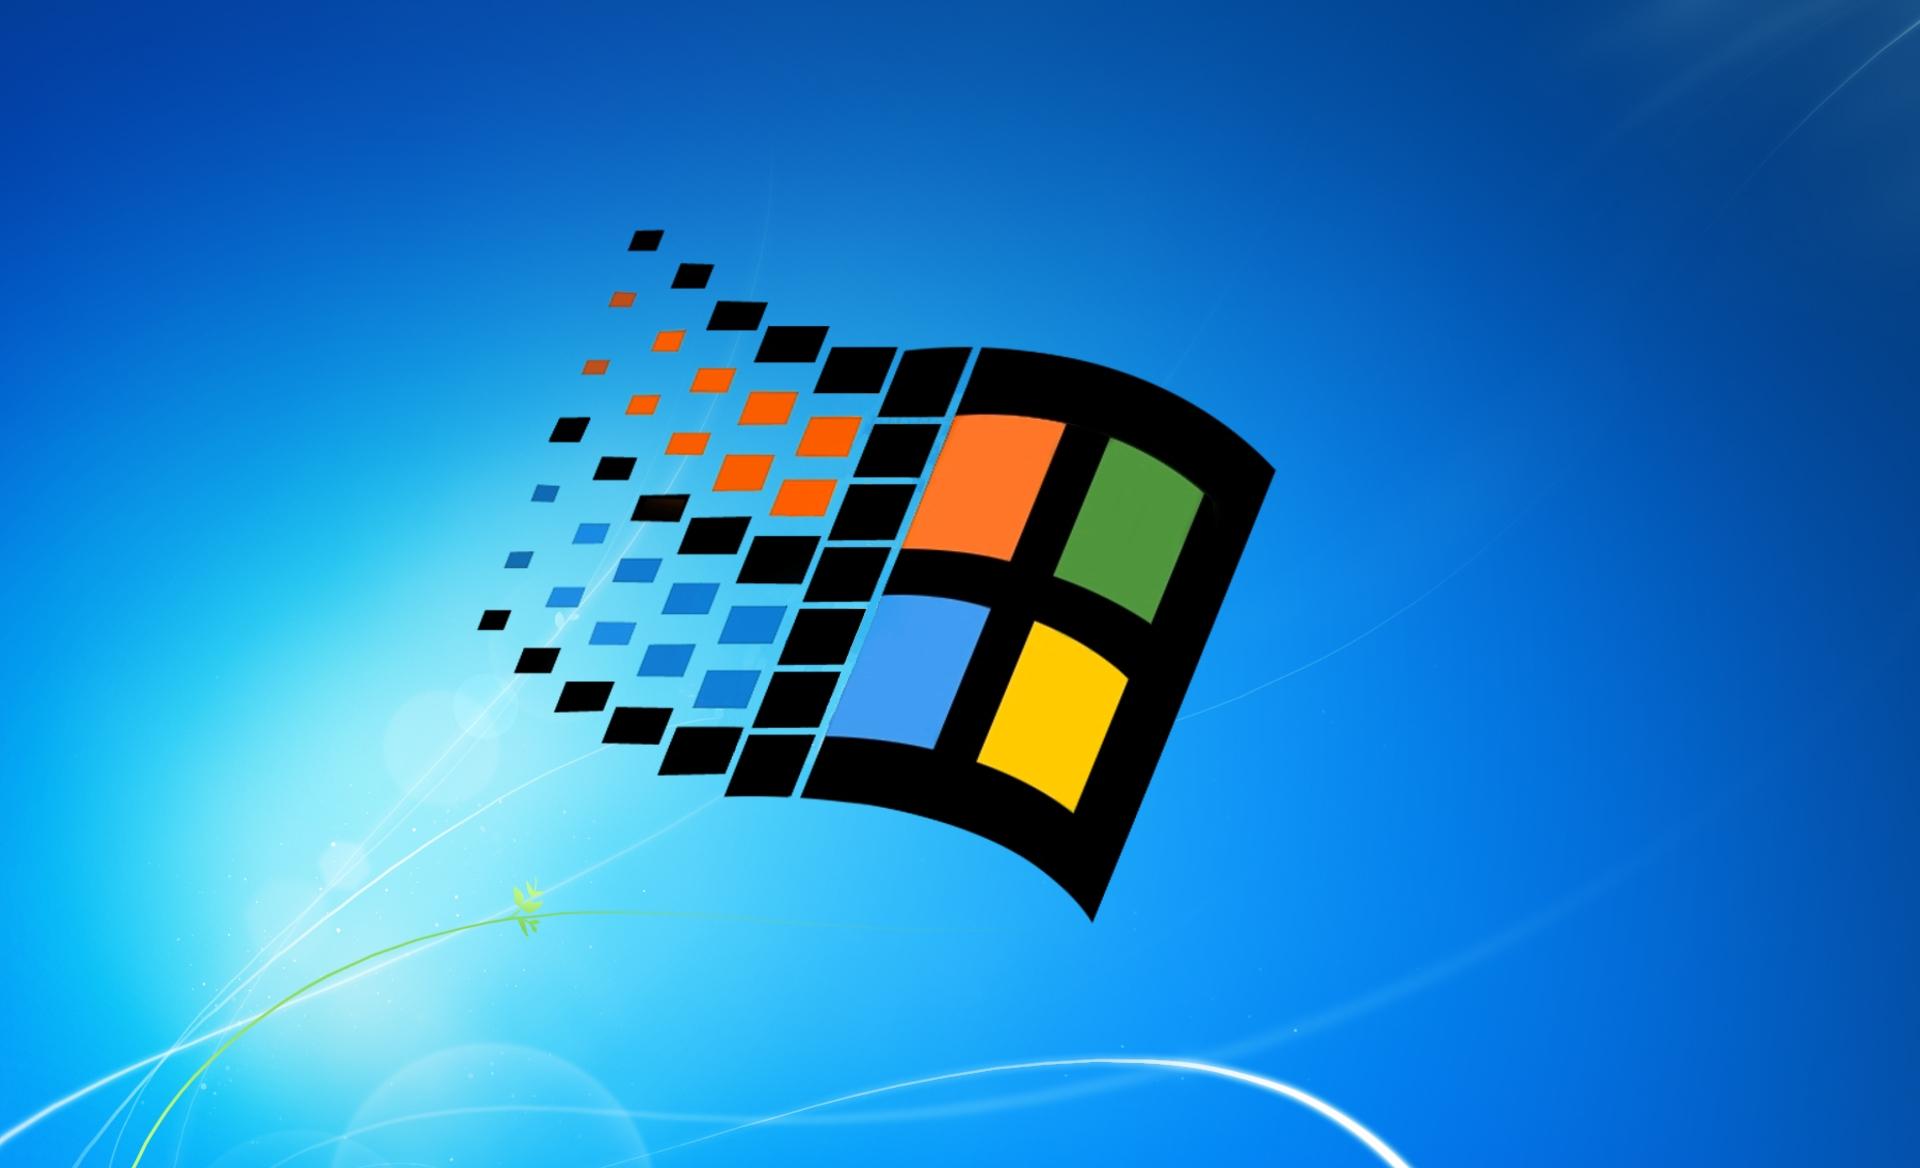 Microsoft Windows Logo Wallpaper